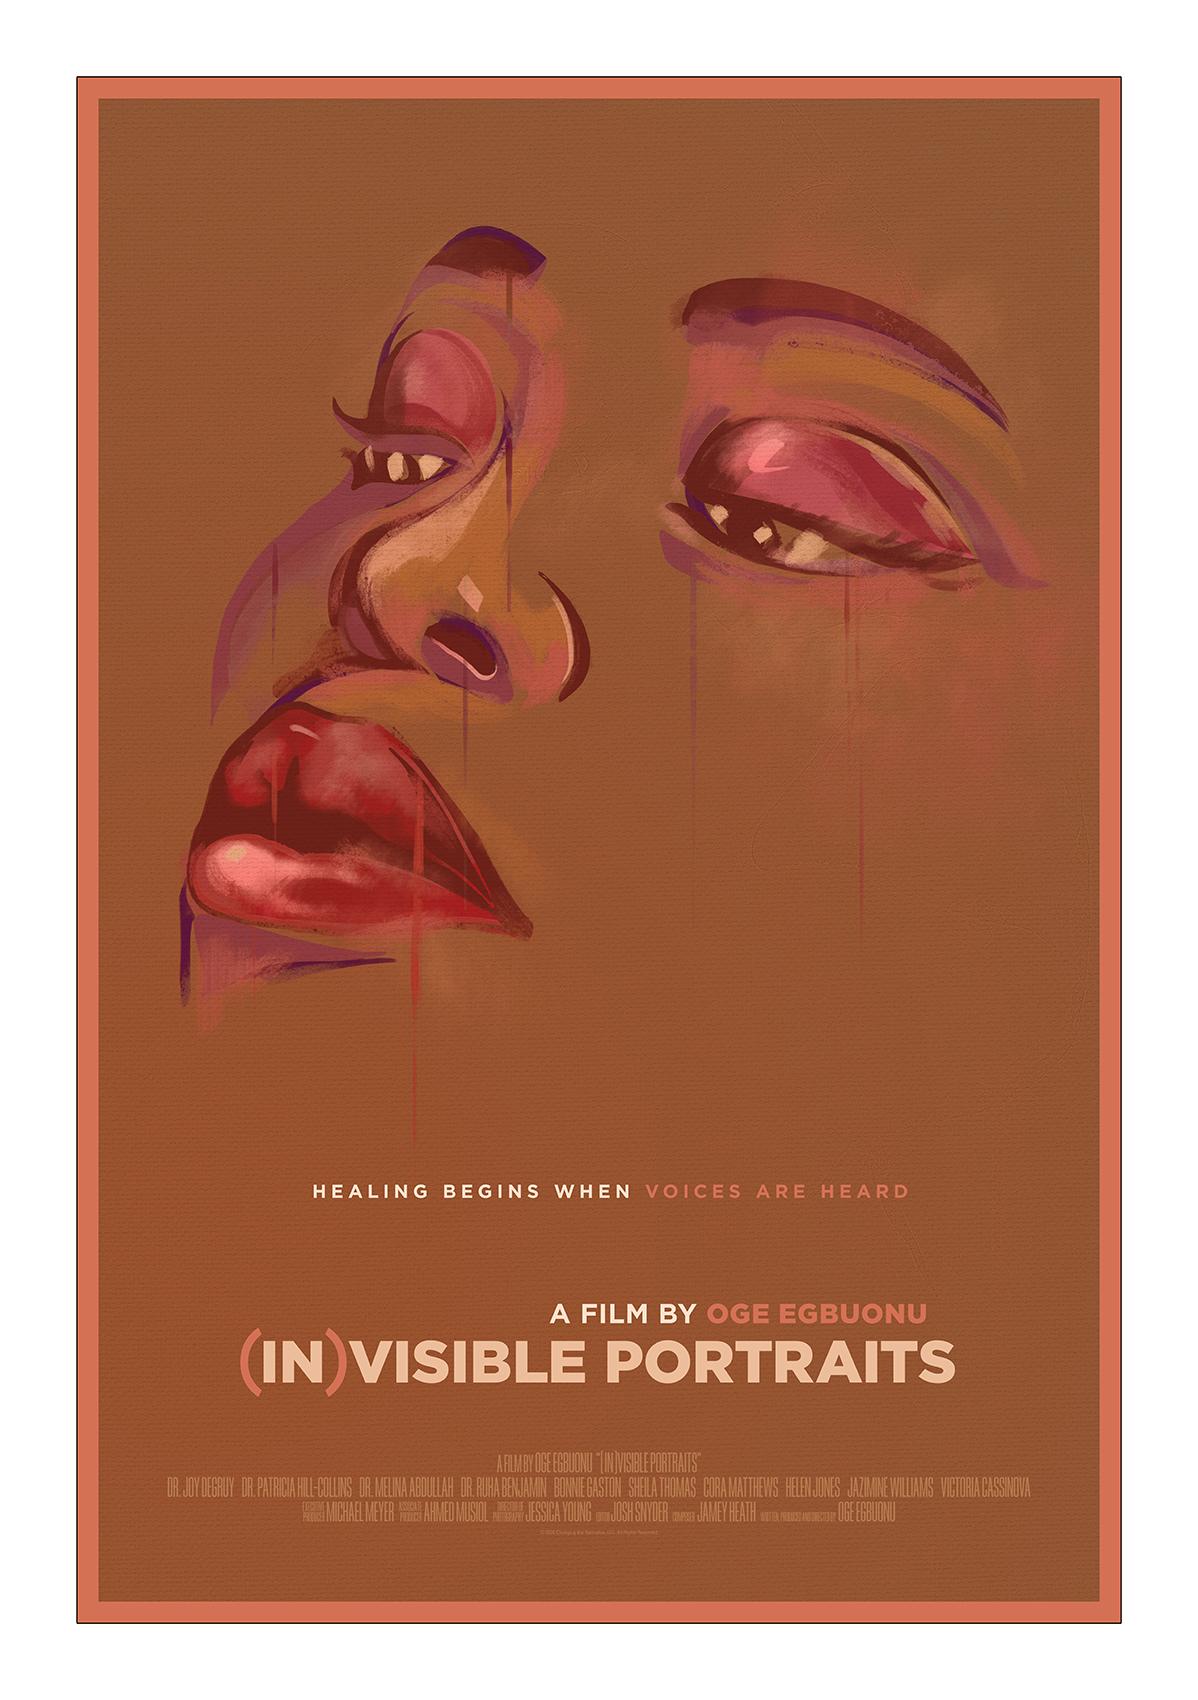 InvisiblePortraits